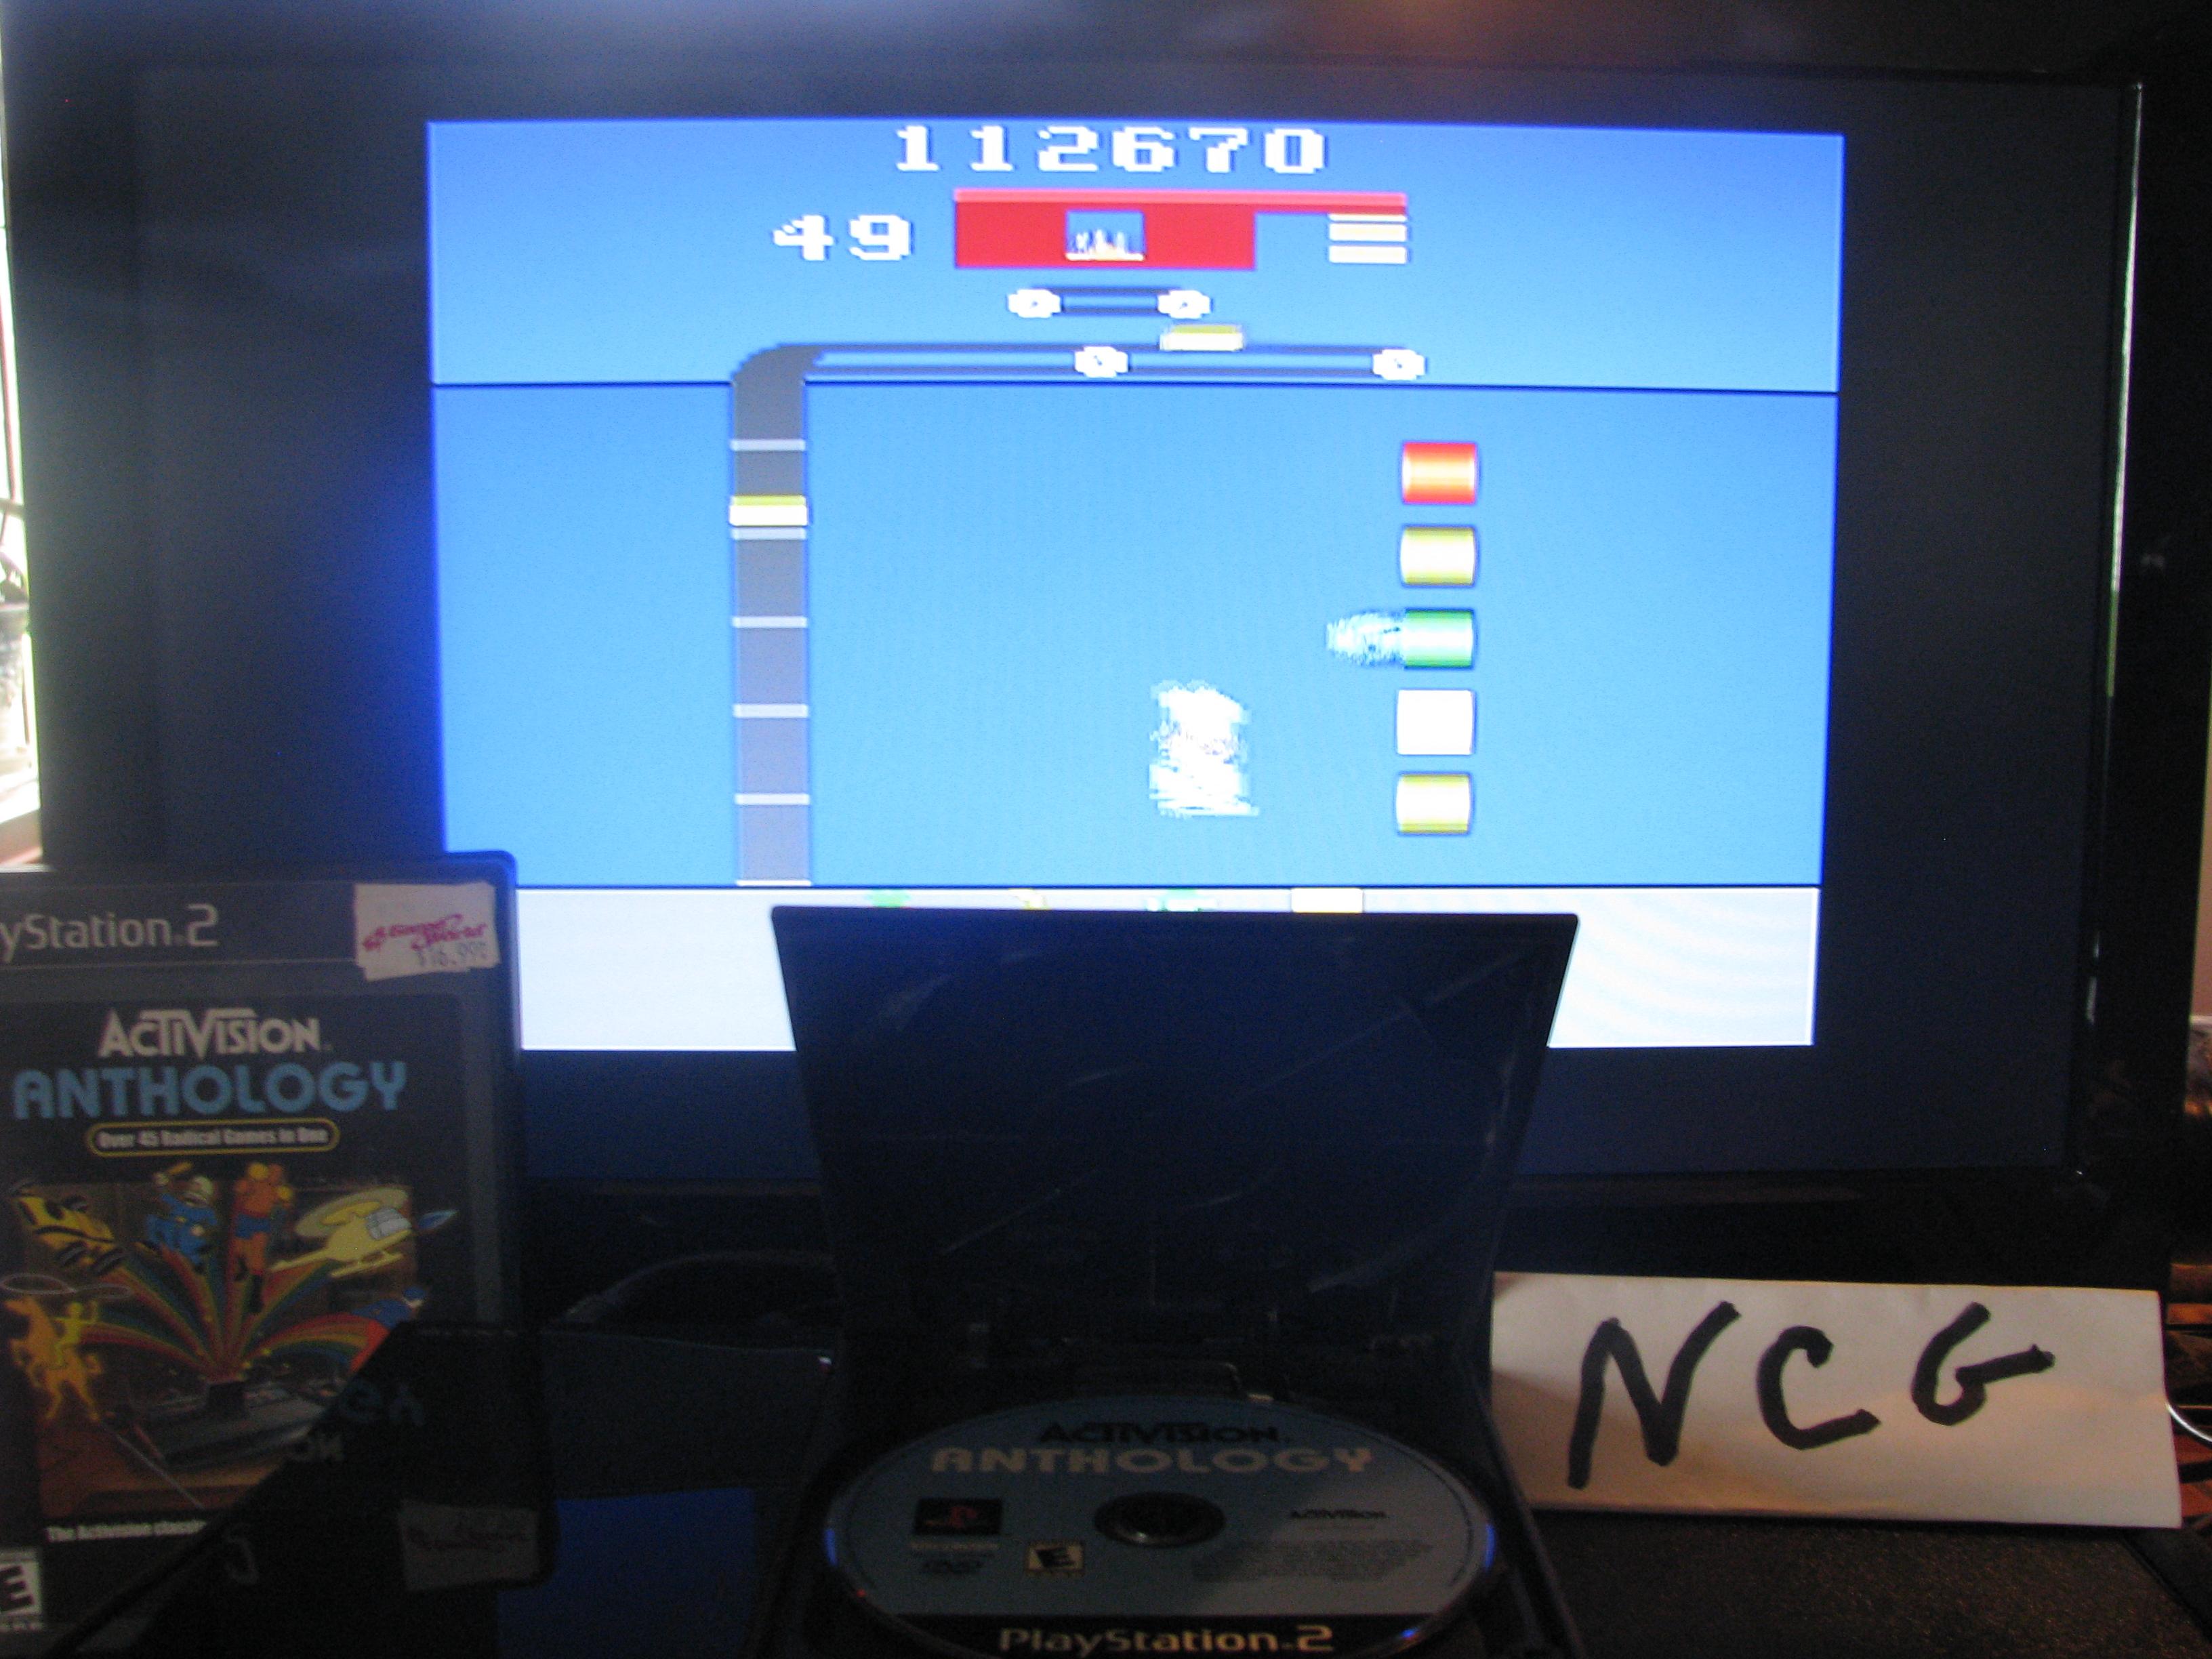 NorthCoastGamer: Activision Anthology: Pressure Cooker [Game 1B] (Playstation 2) 112,670 points on 2014-10-15 14:52:42